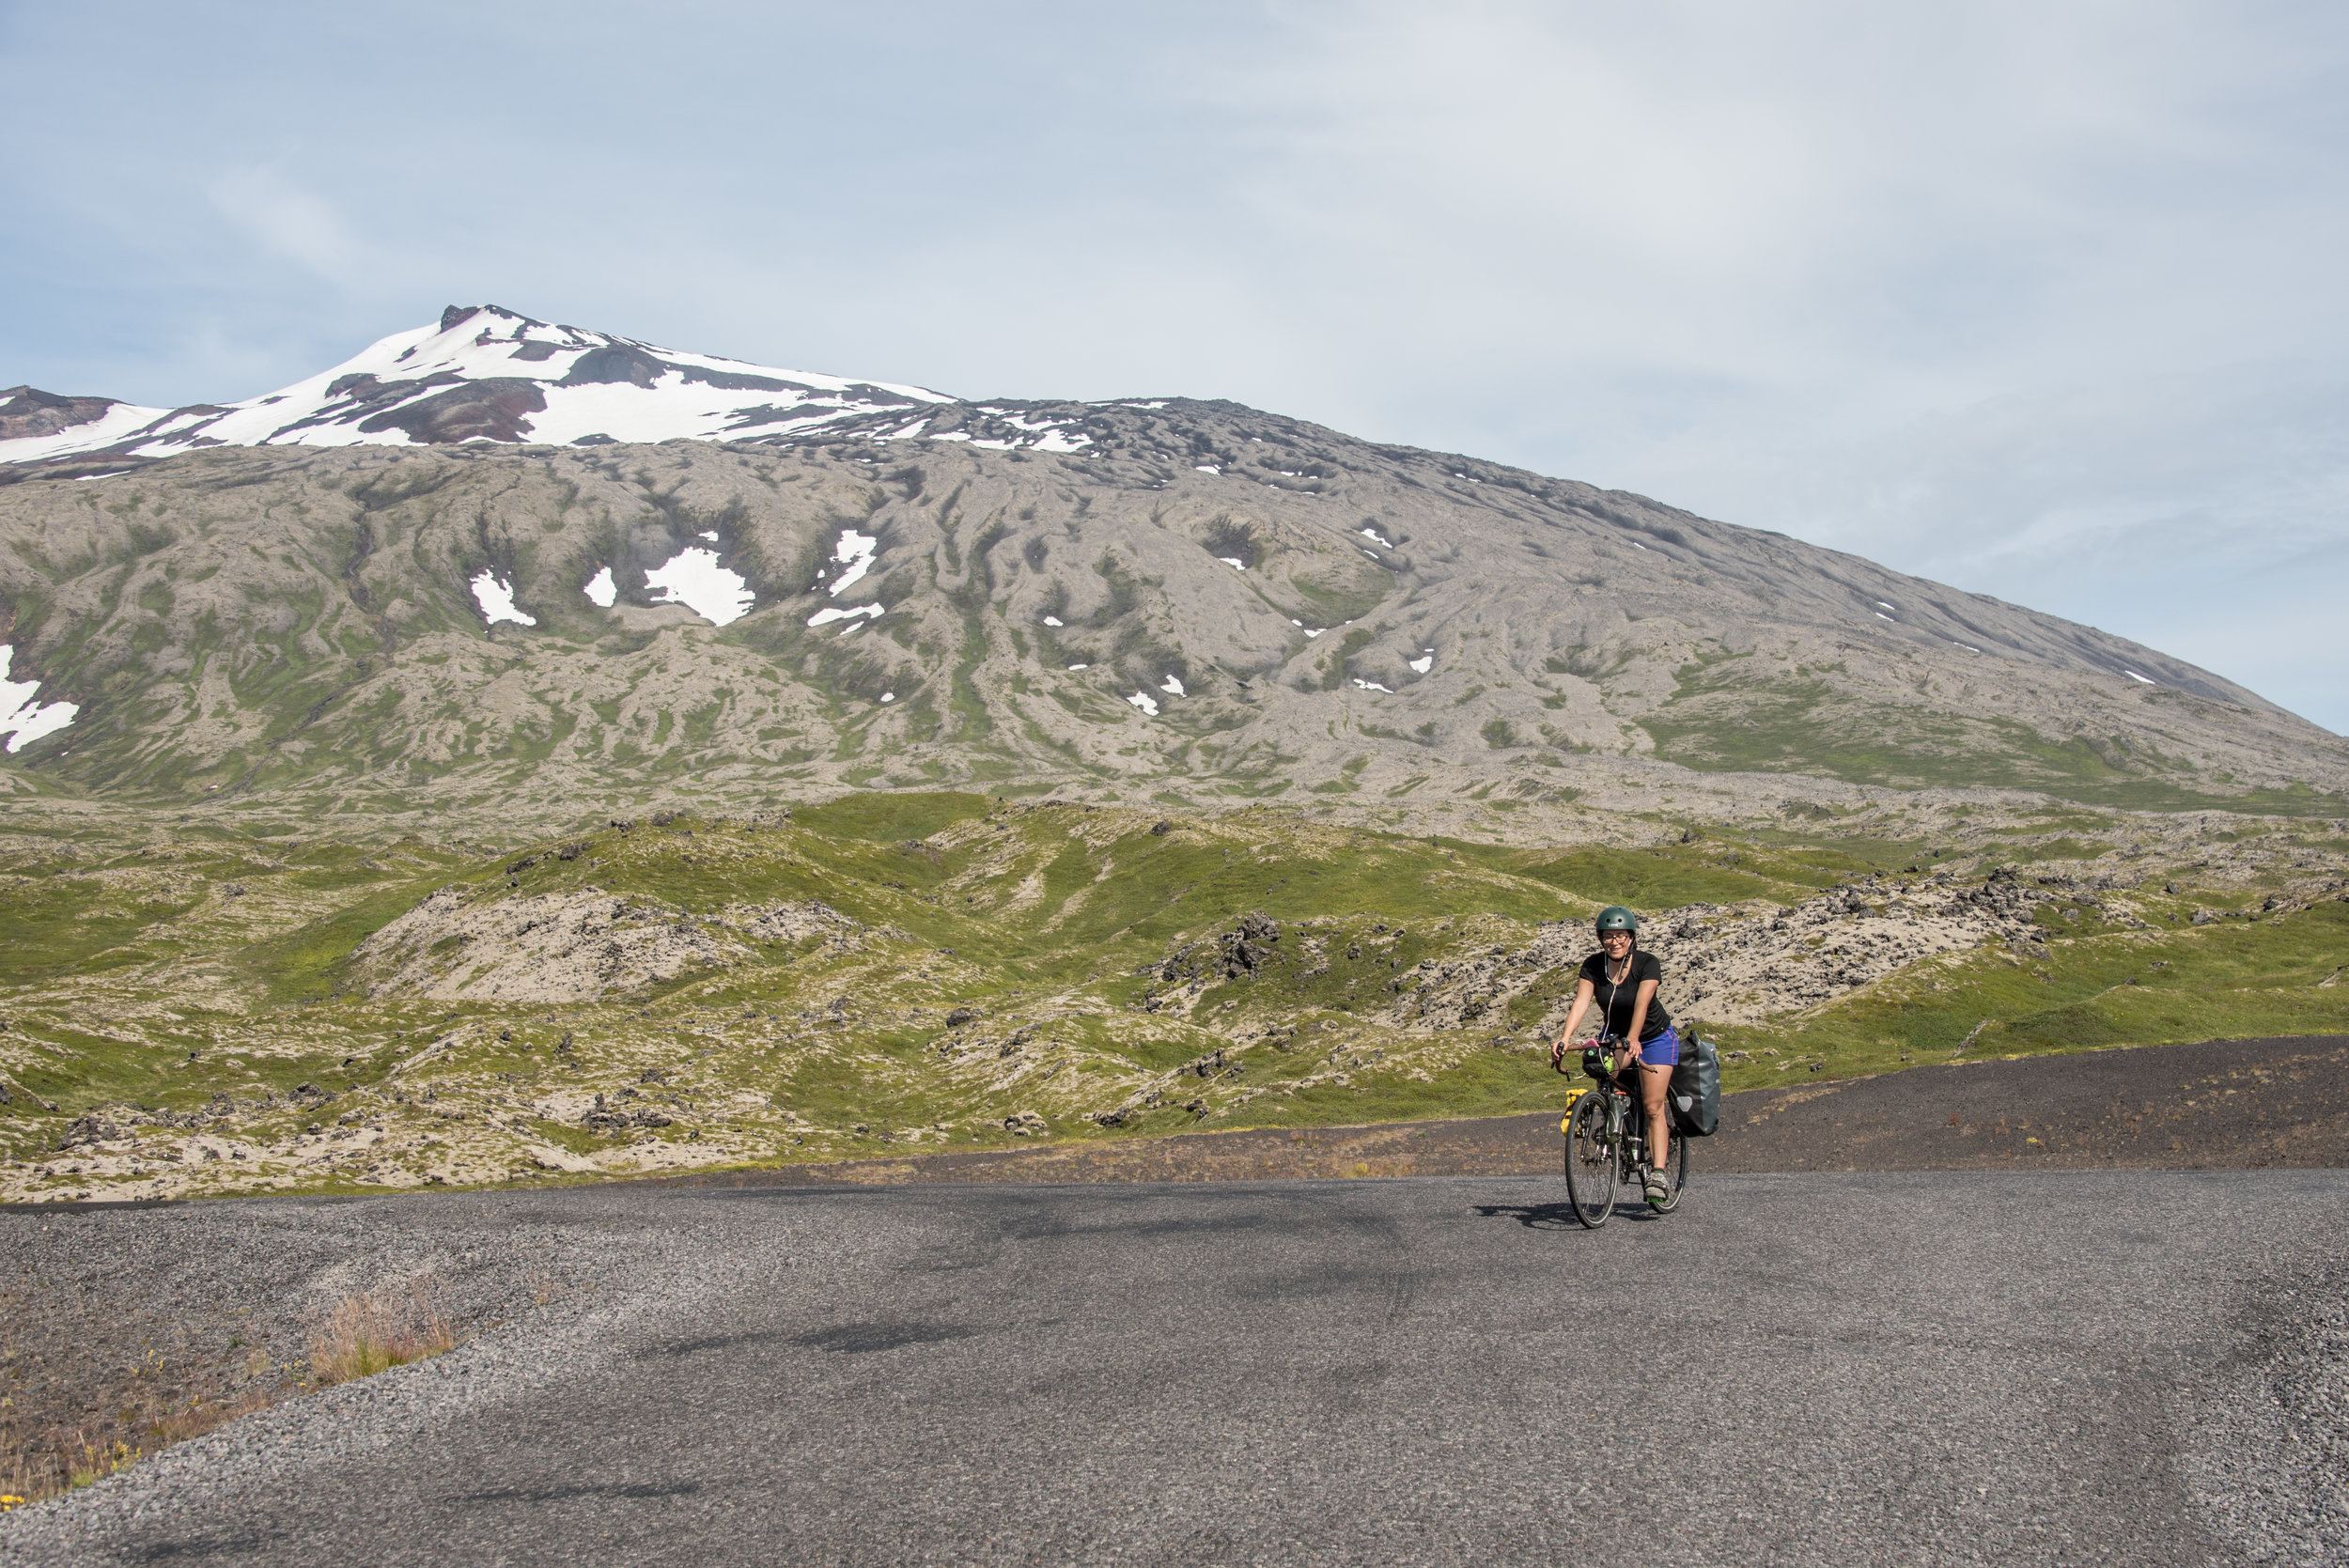 Rounding the Snæfellsjökull stratovolcano on the edge of Iceland's   Snæfellsnes peninsula.